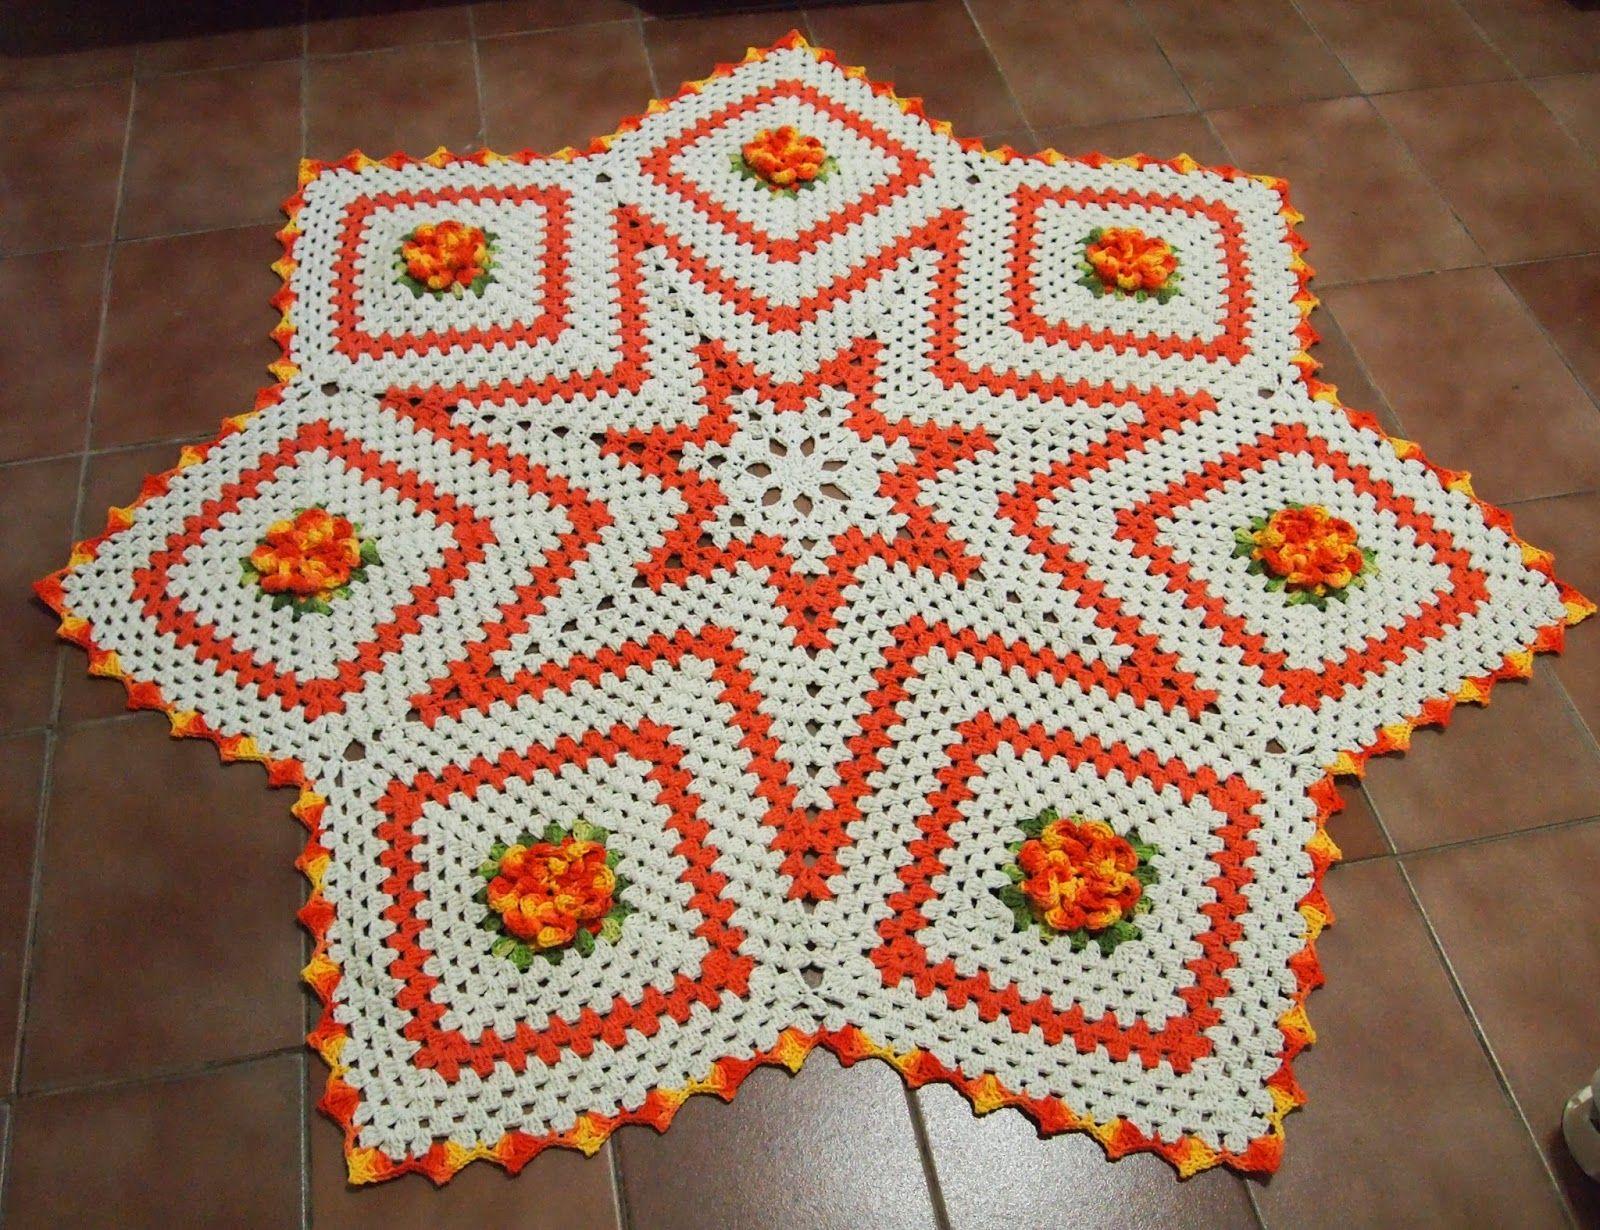 75 modelos de tapetes de barbante para inspirar for Tapetes de crochet